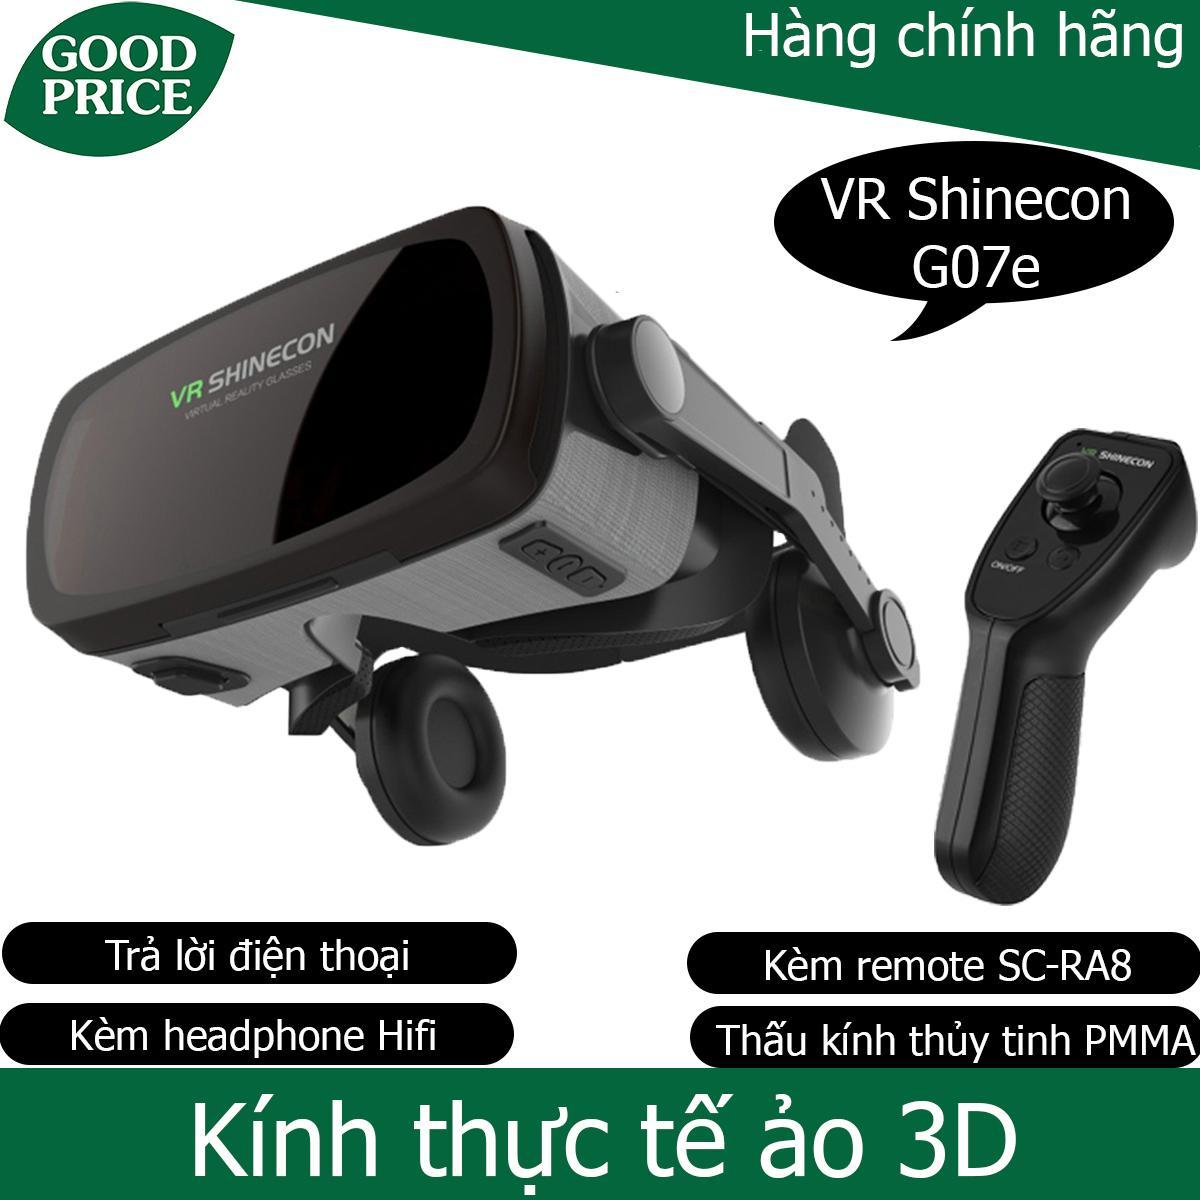 Kính thực tế ảo Vr Shinecon G07E - kèm remote bluetooth Shinecon SC-RA8